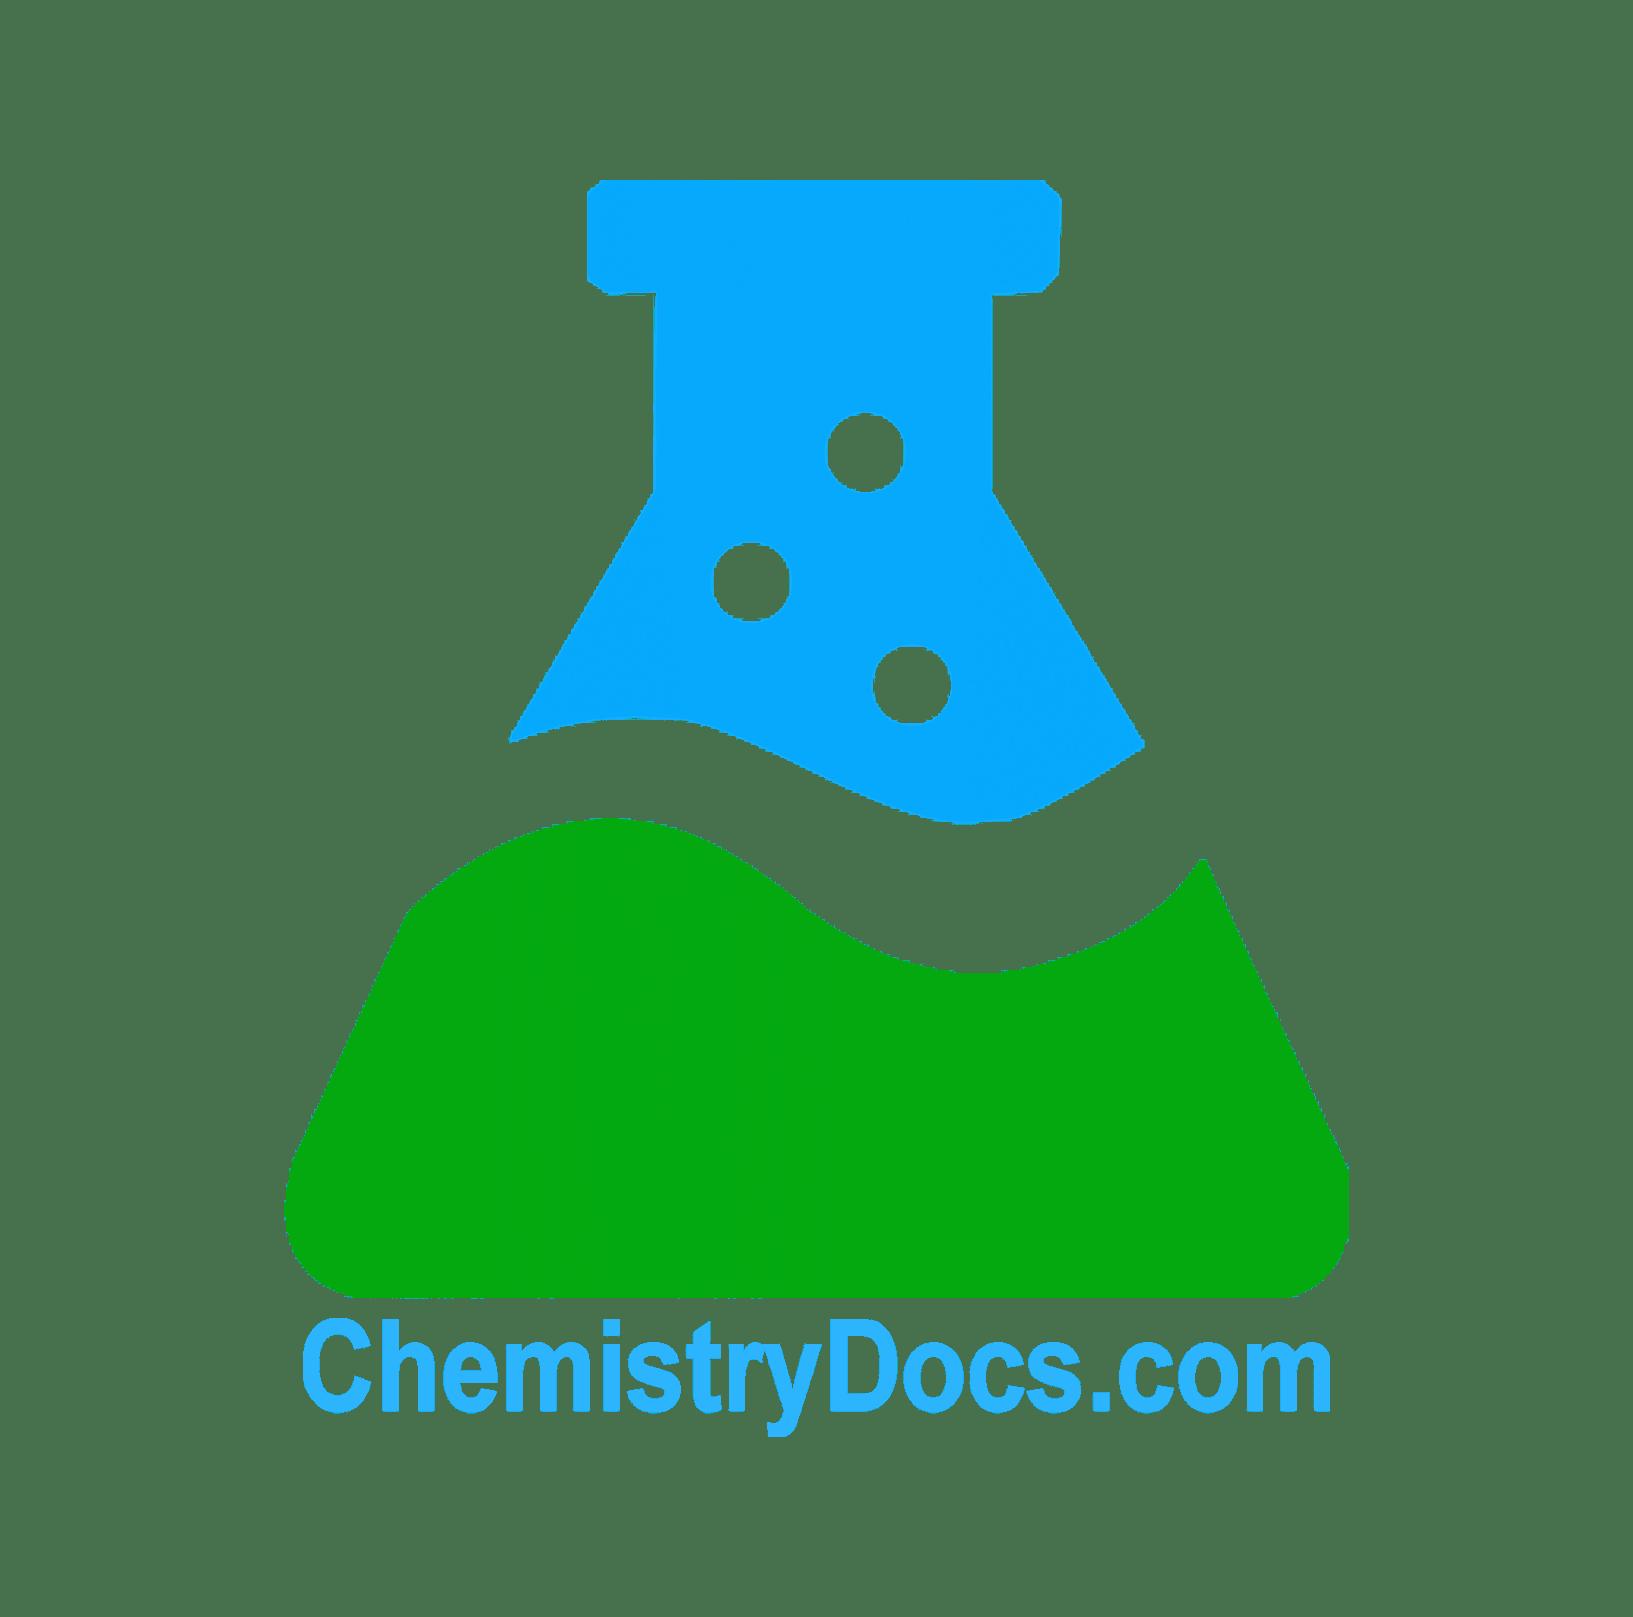 Chemistrydocs.com logo